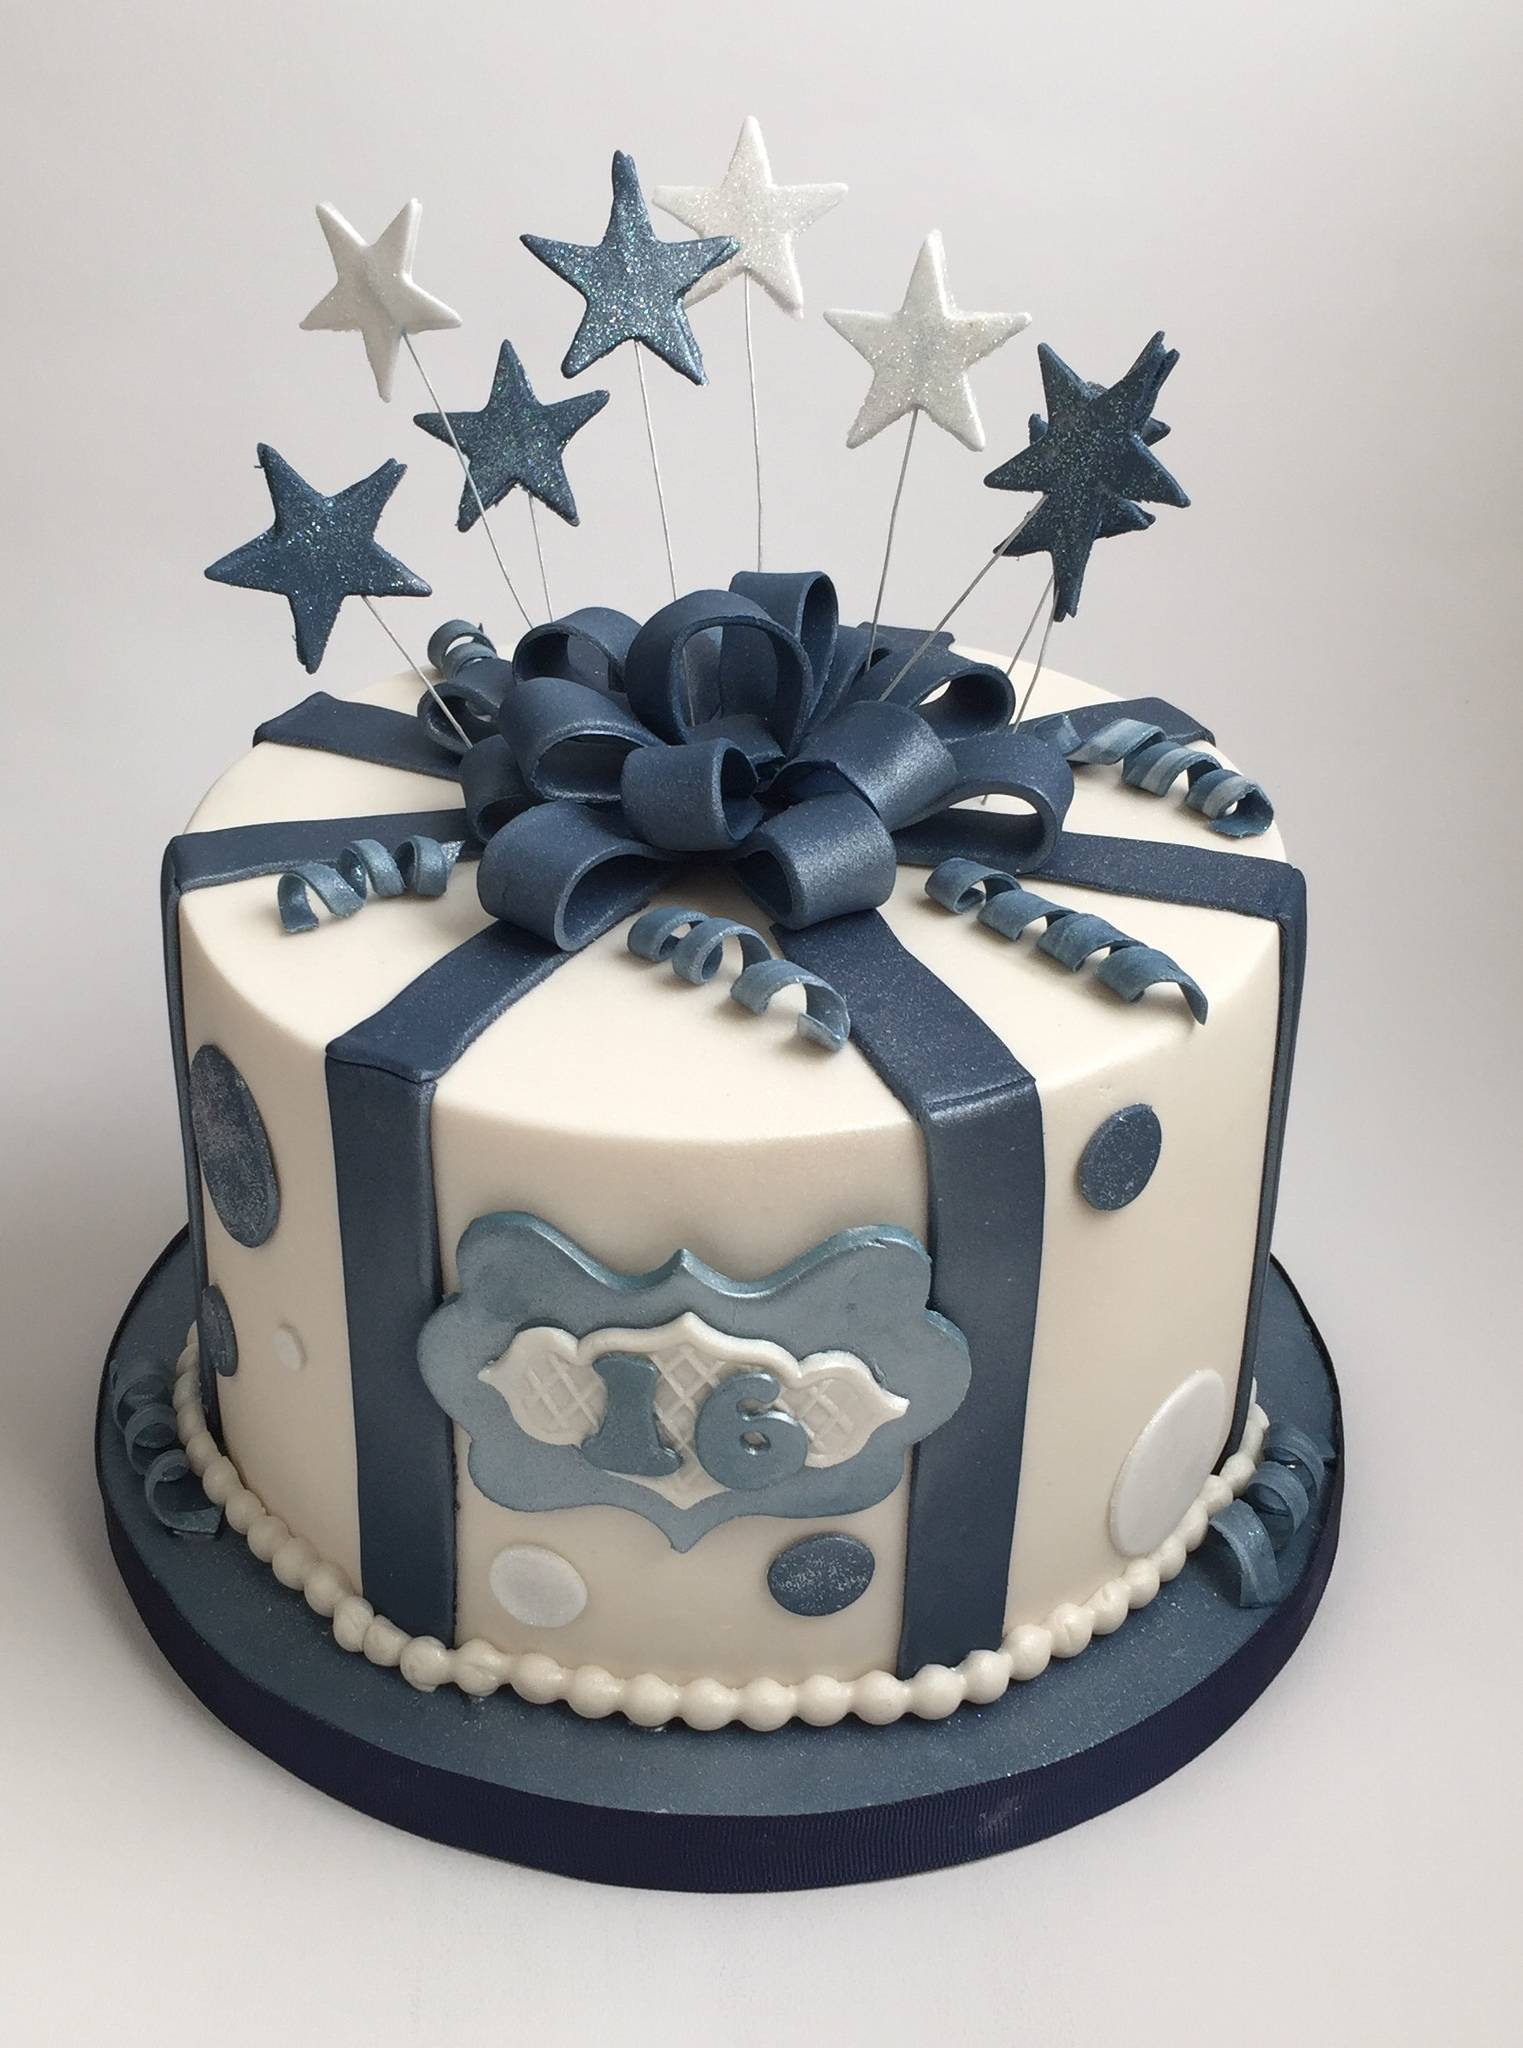 Year Old Birthday Cake Boys Cakes For Years Photo Jpg 640x860 Boy